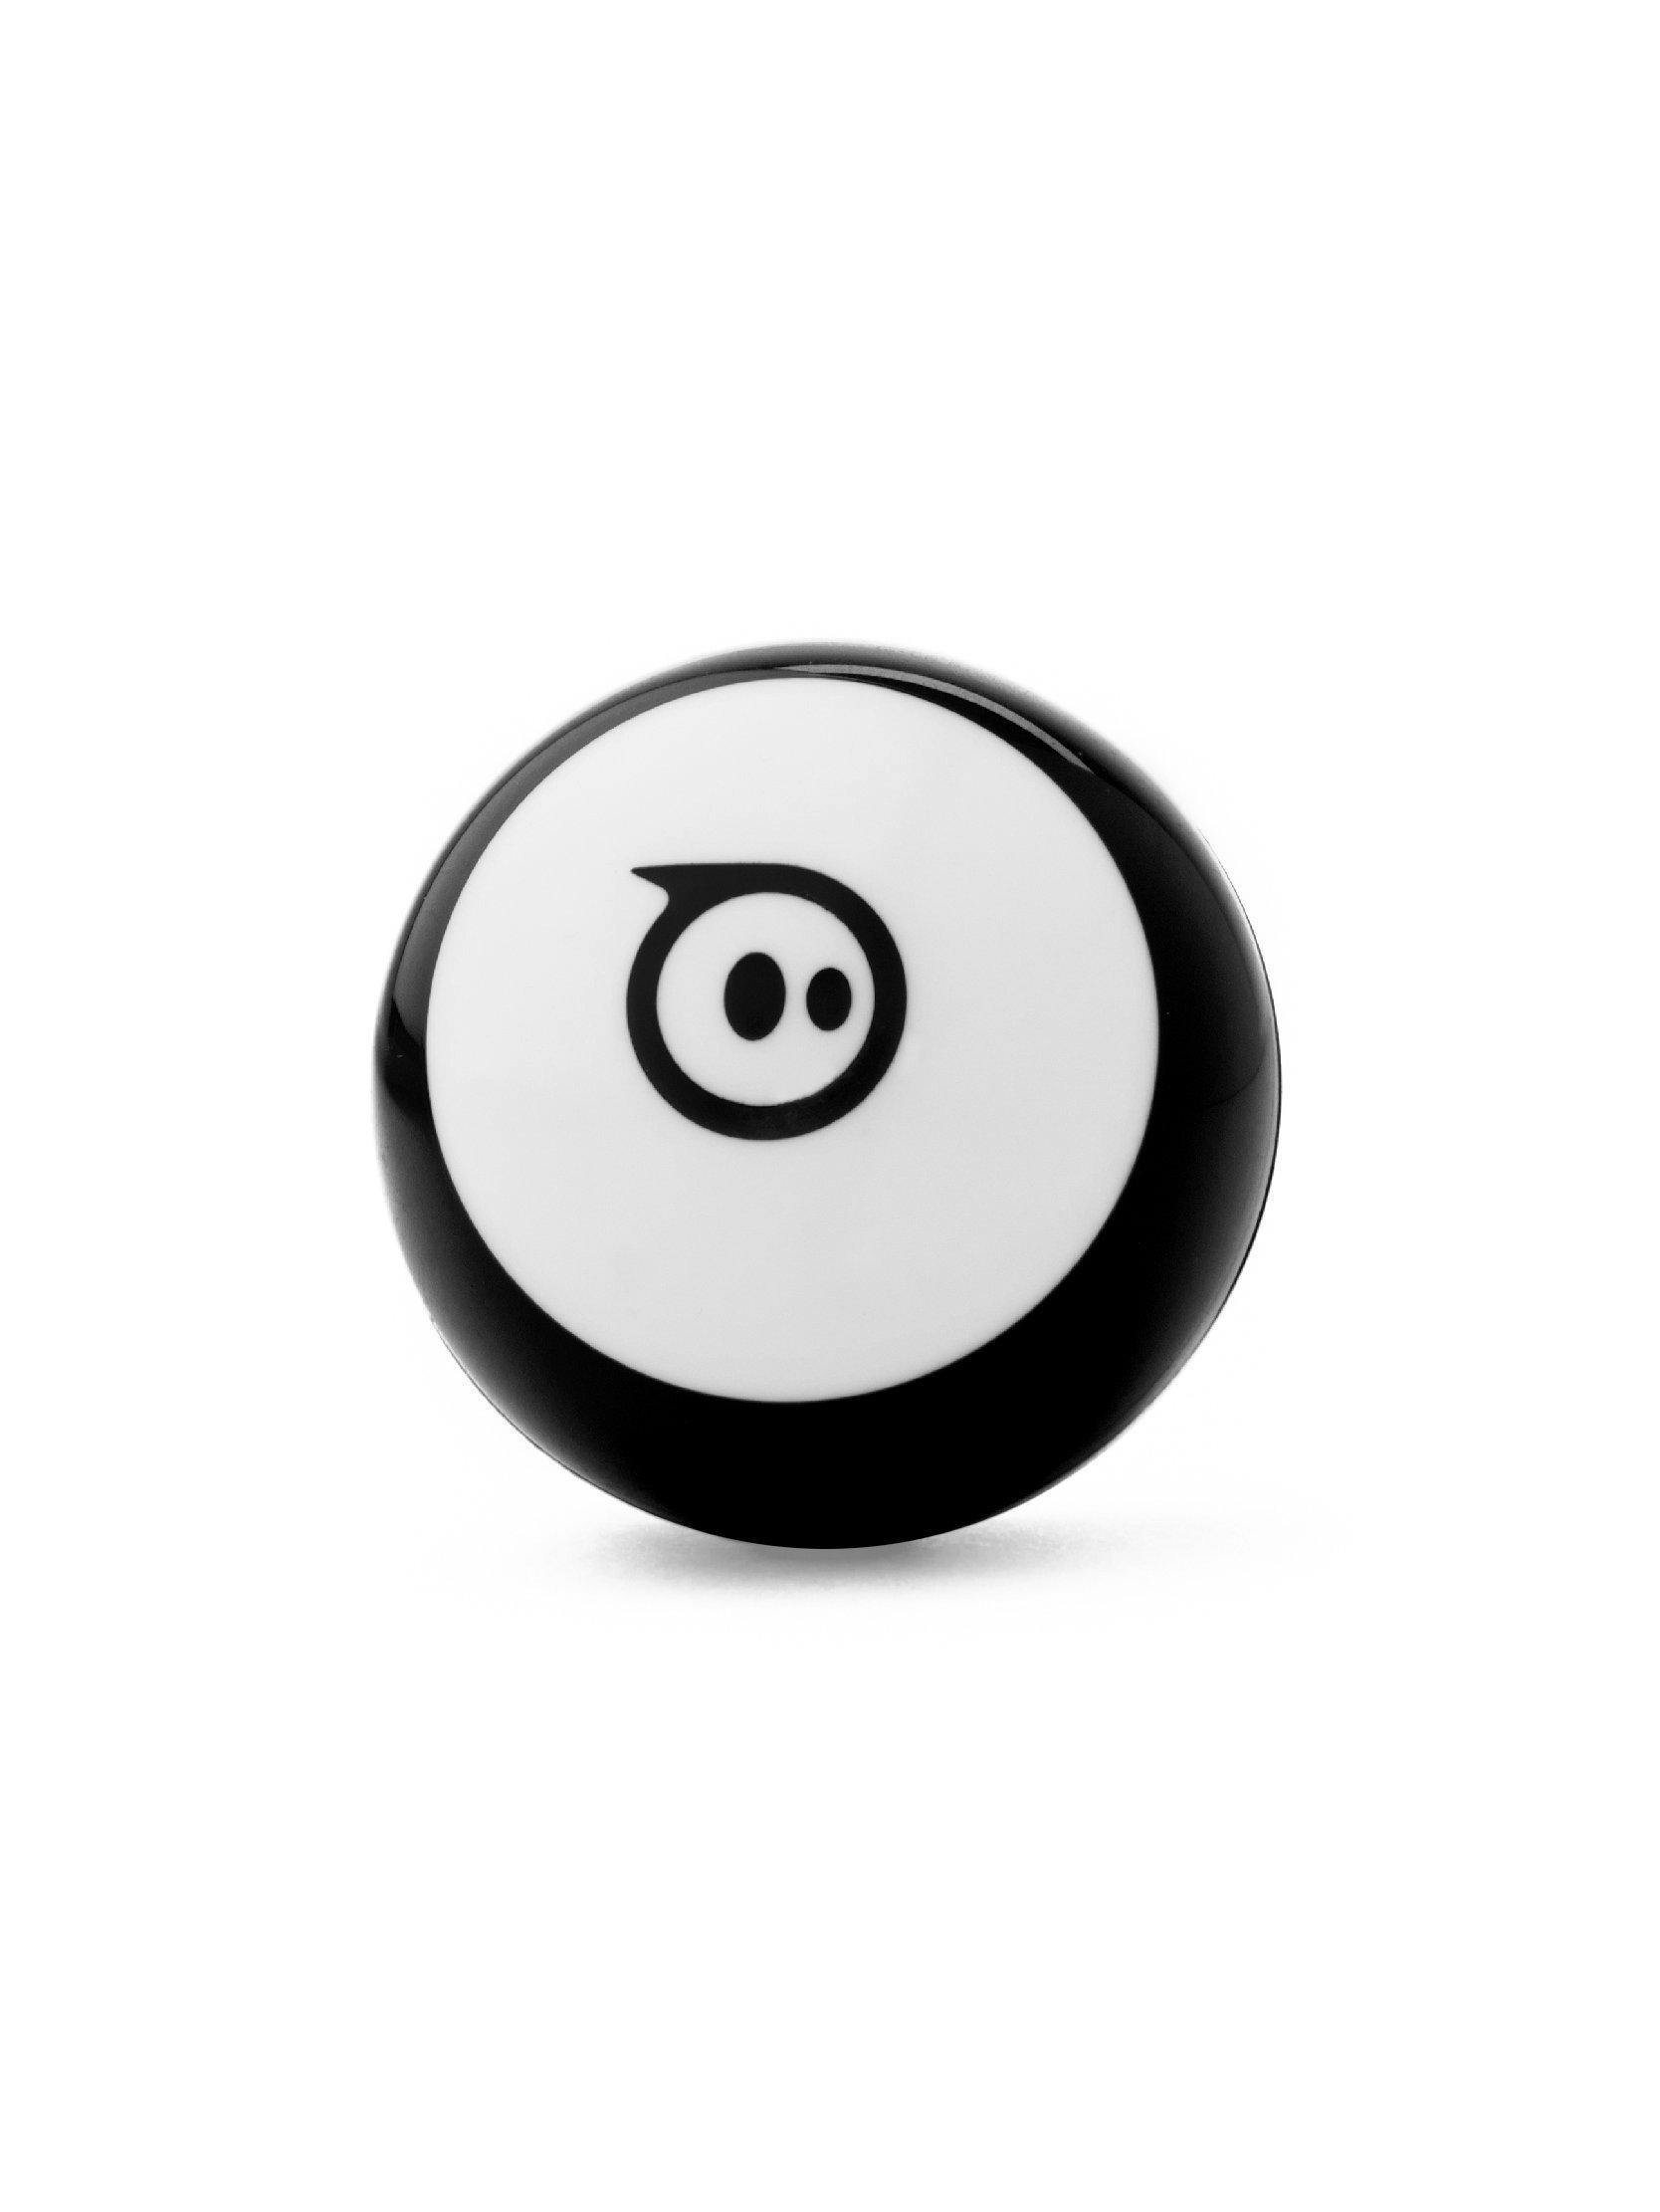 Sphero Mini Black: The App-Controlled Robot Ball (Amazon Exclusive) by Sphero (Image #1)